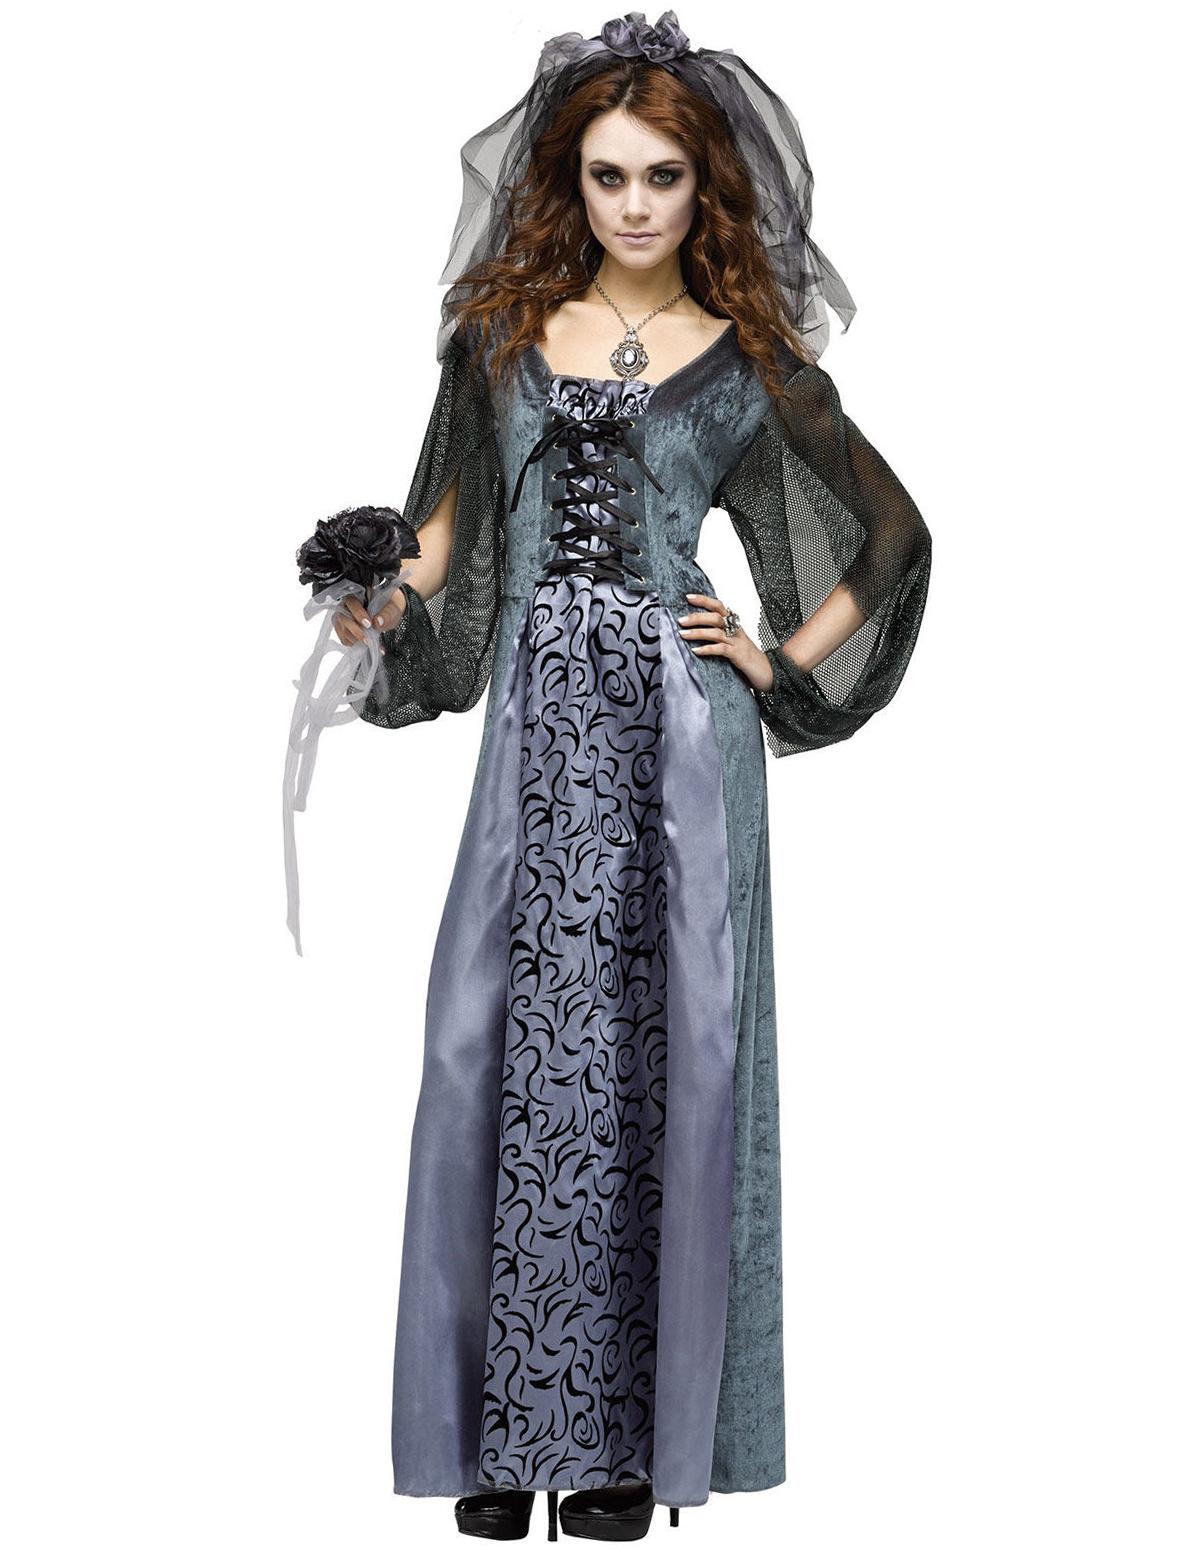 Zombie Braut Halloween Damenkostum Grau Schwarz Gunstige Faschings